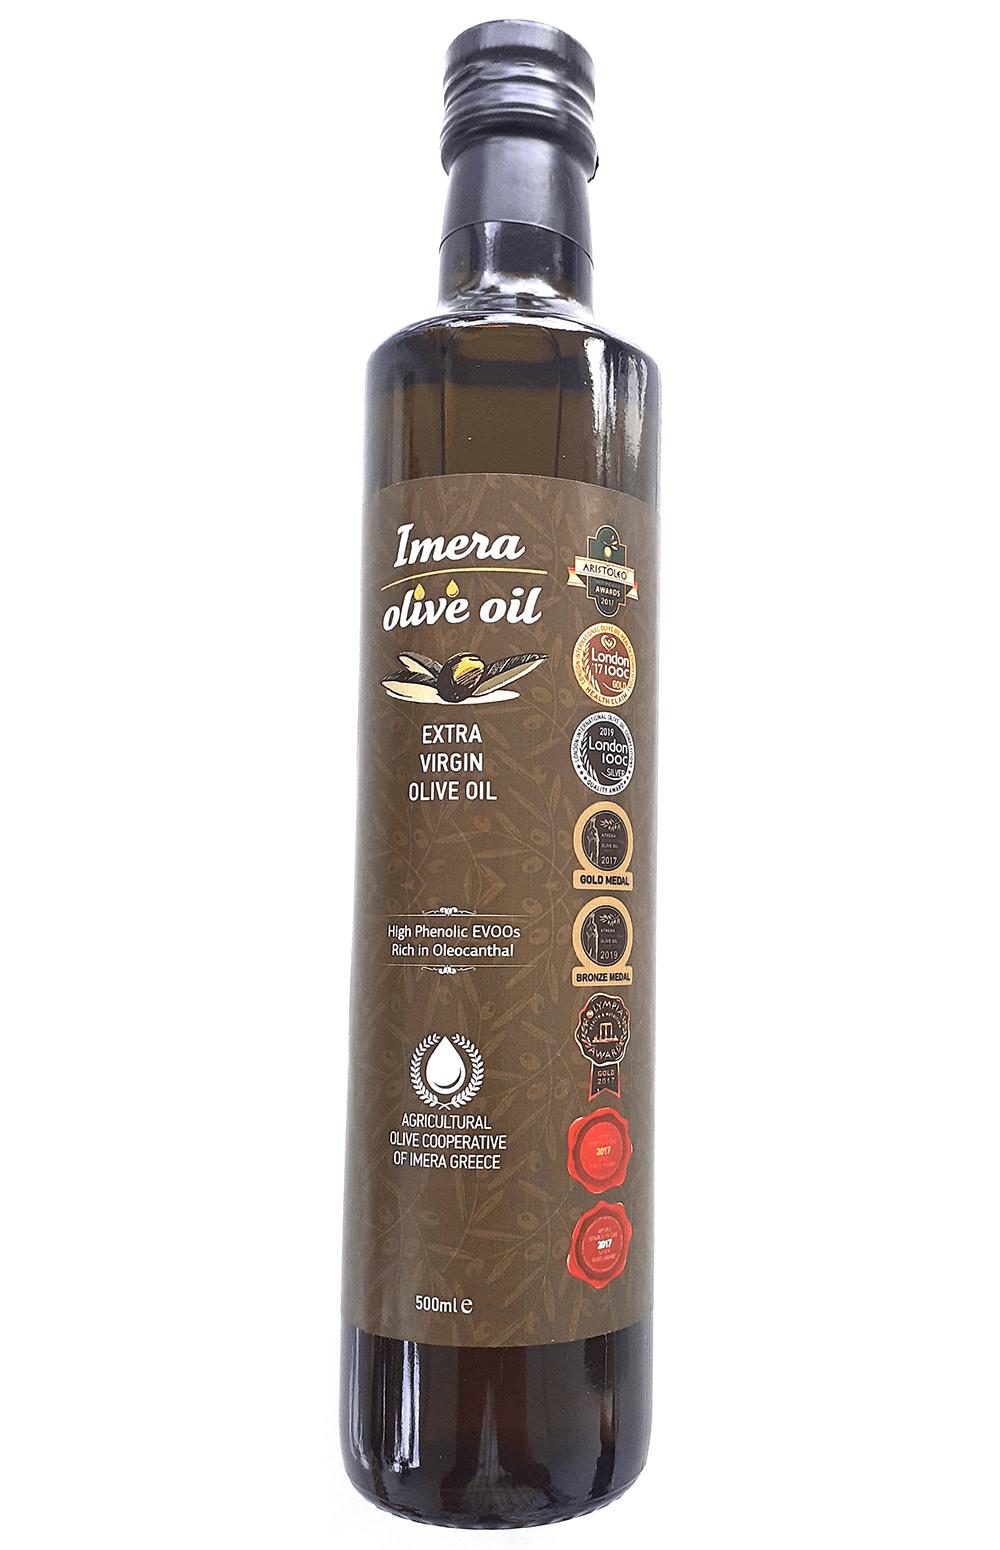 Imera olive oil